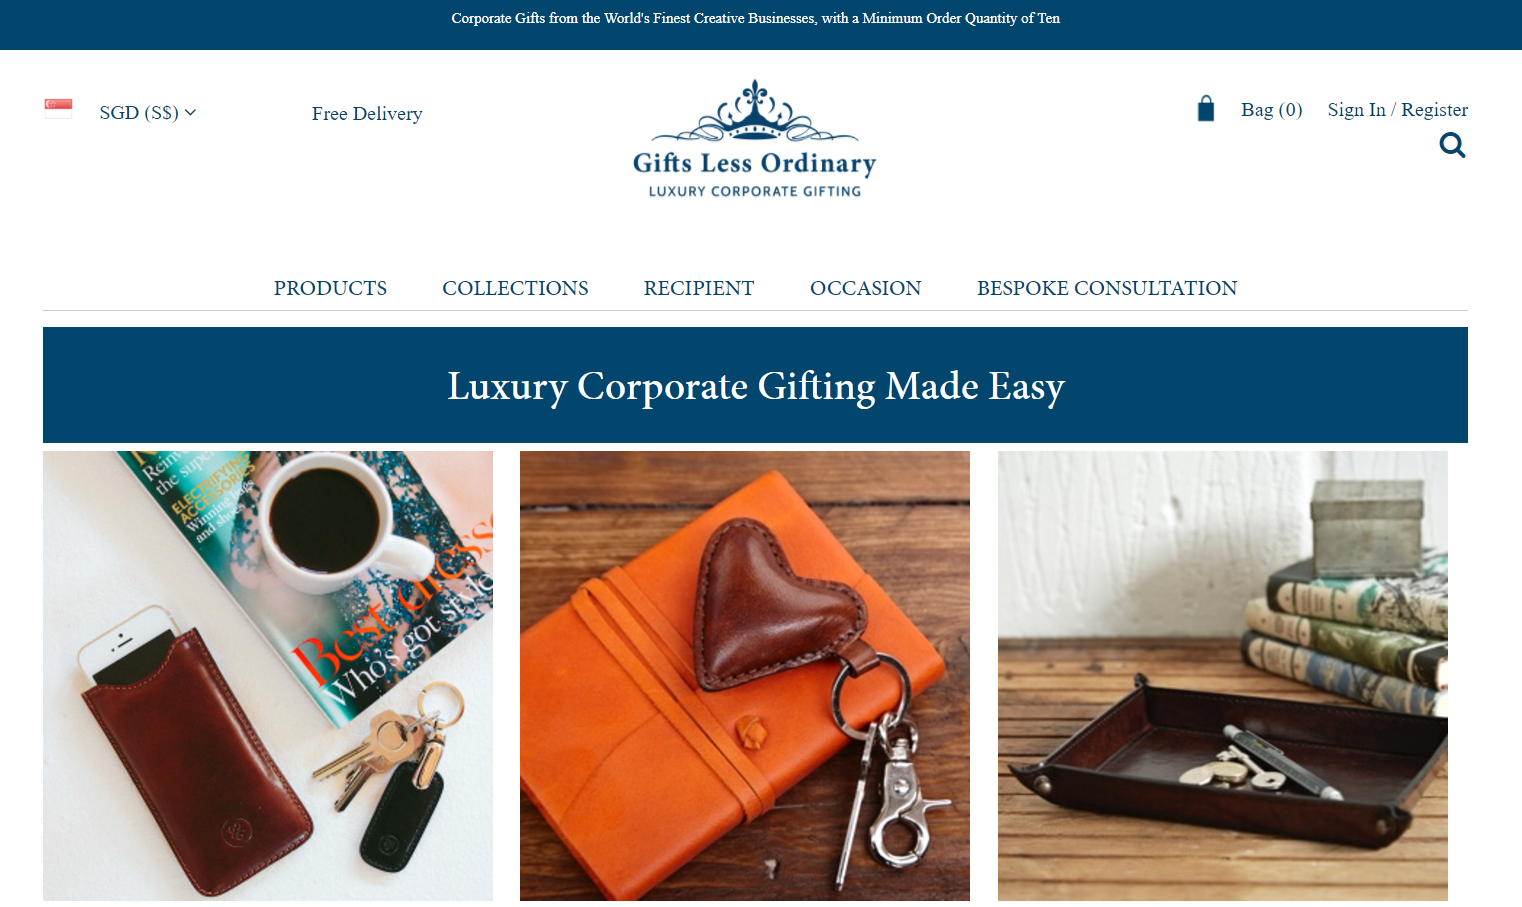 The Beauty Junkie - ranechin com: Corporate Gifts Idea